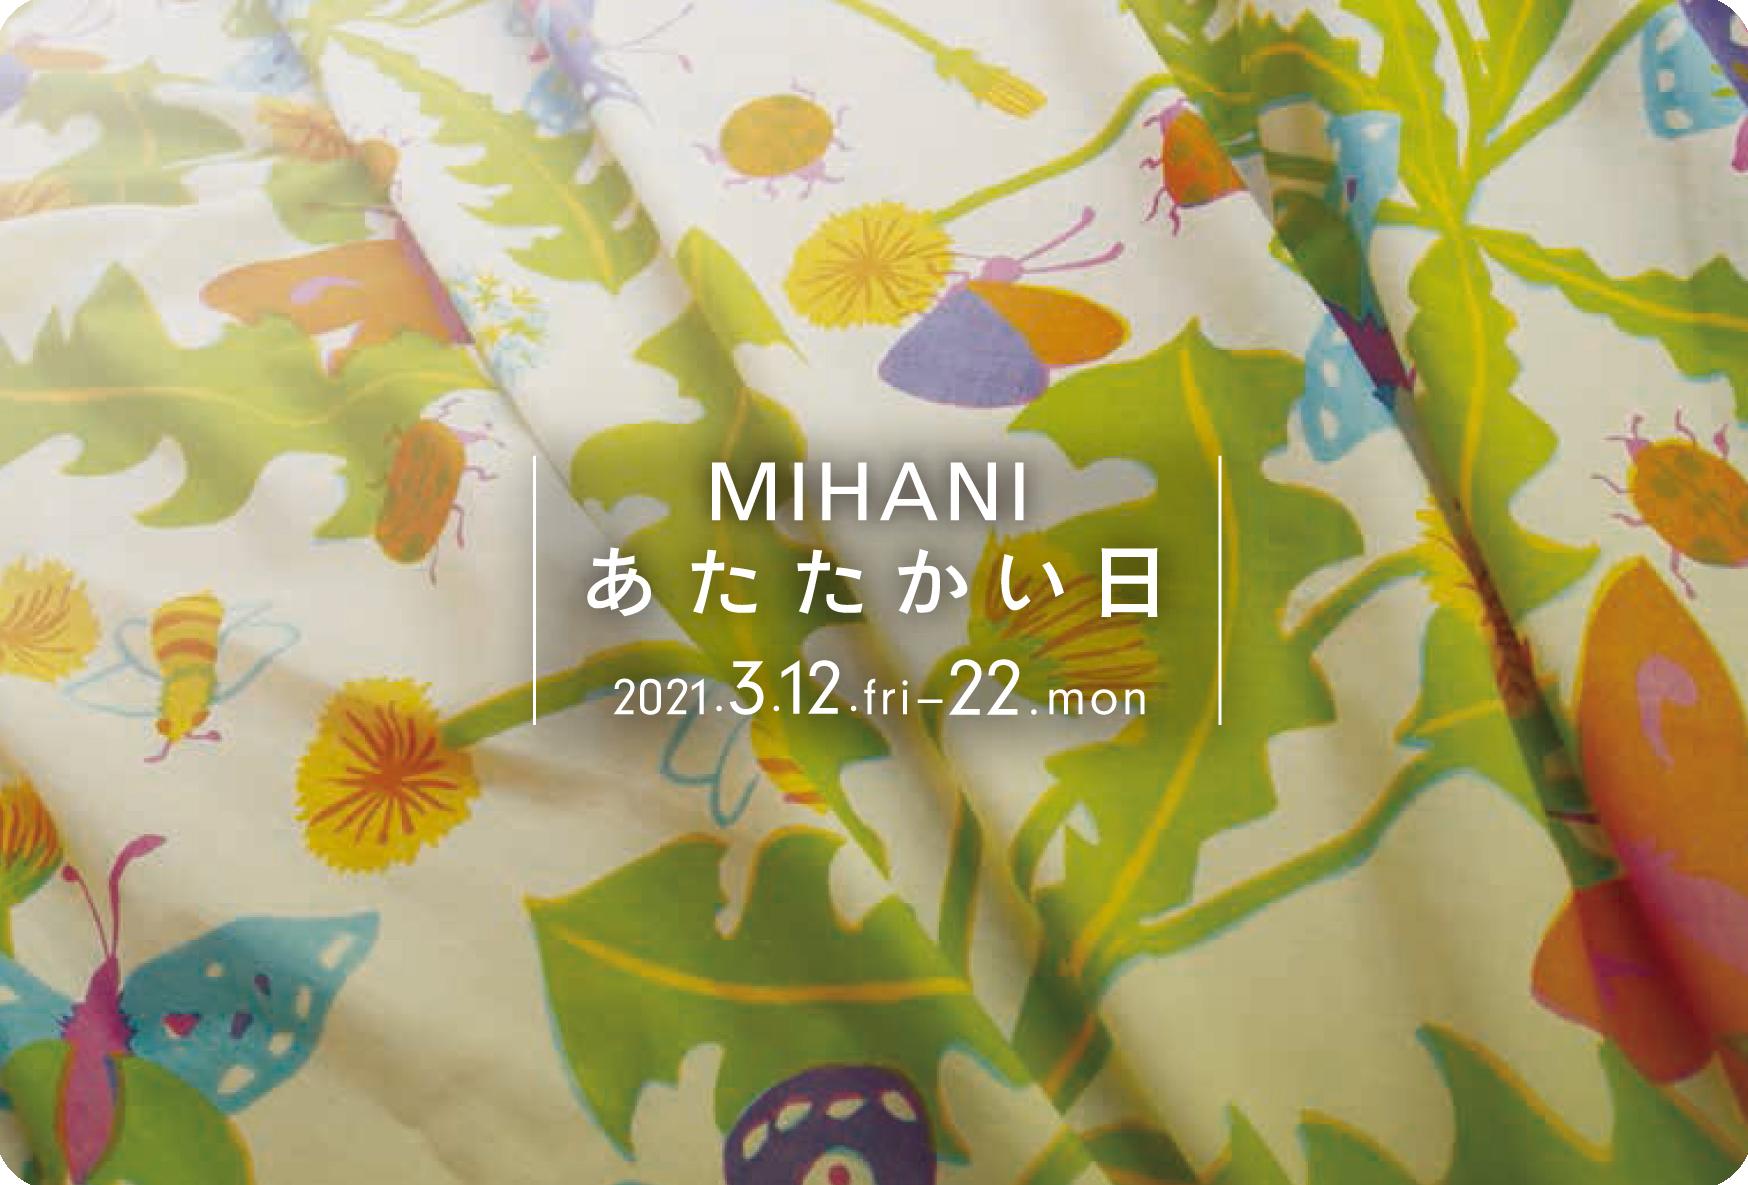 MIHANI個展「あたたかい日」(2021.3.12 – 3.22)